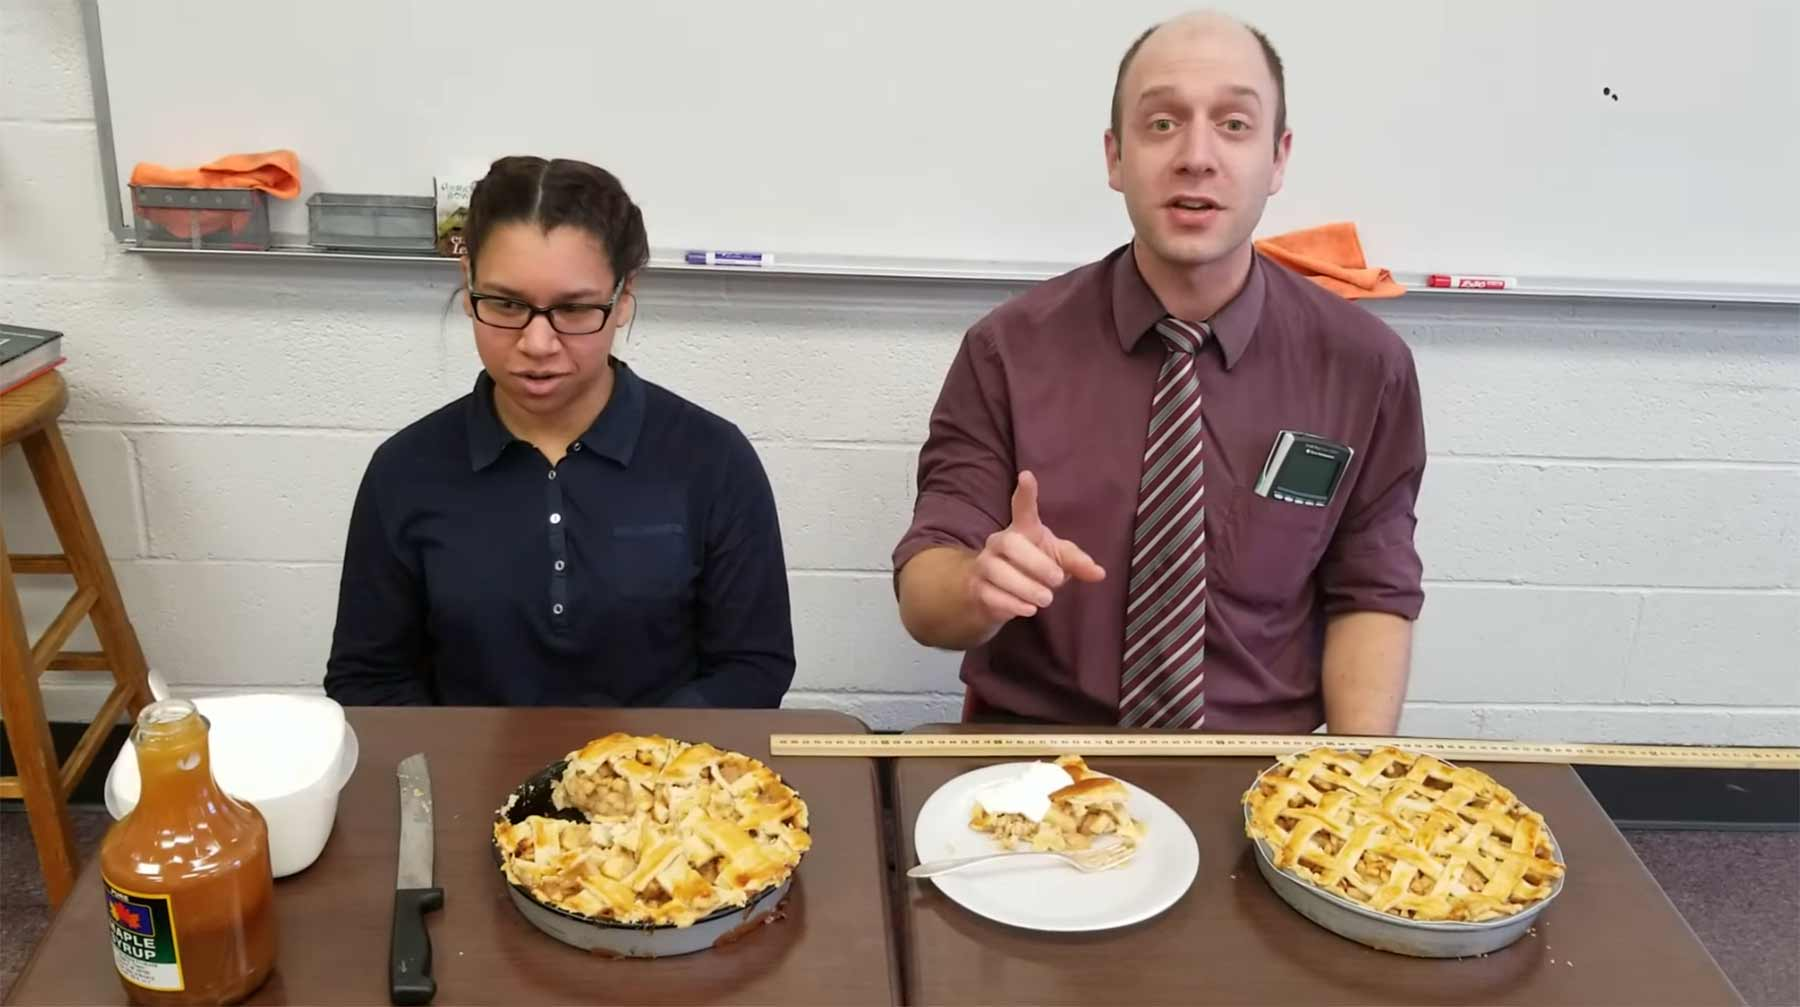 Mathelehrer ertanzt sich Kuchen und erklärt dann Pi daran mathelehrer-erklaert-Pi-an-apfelkuchen